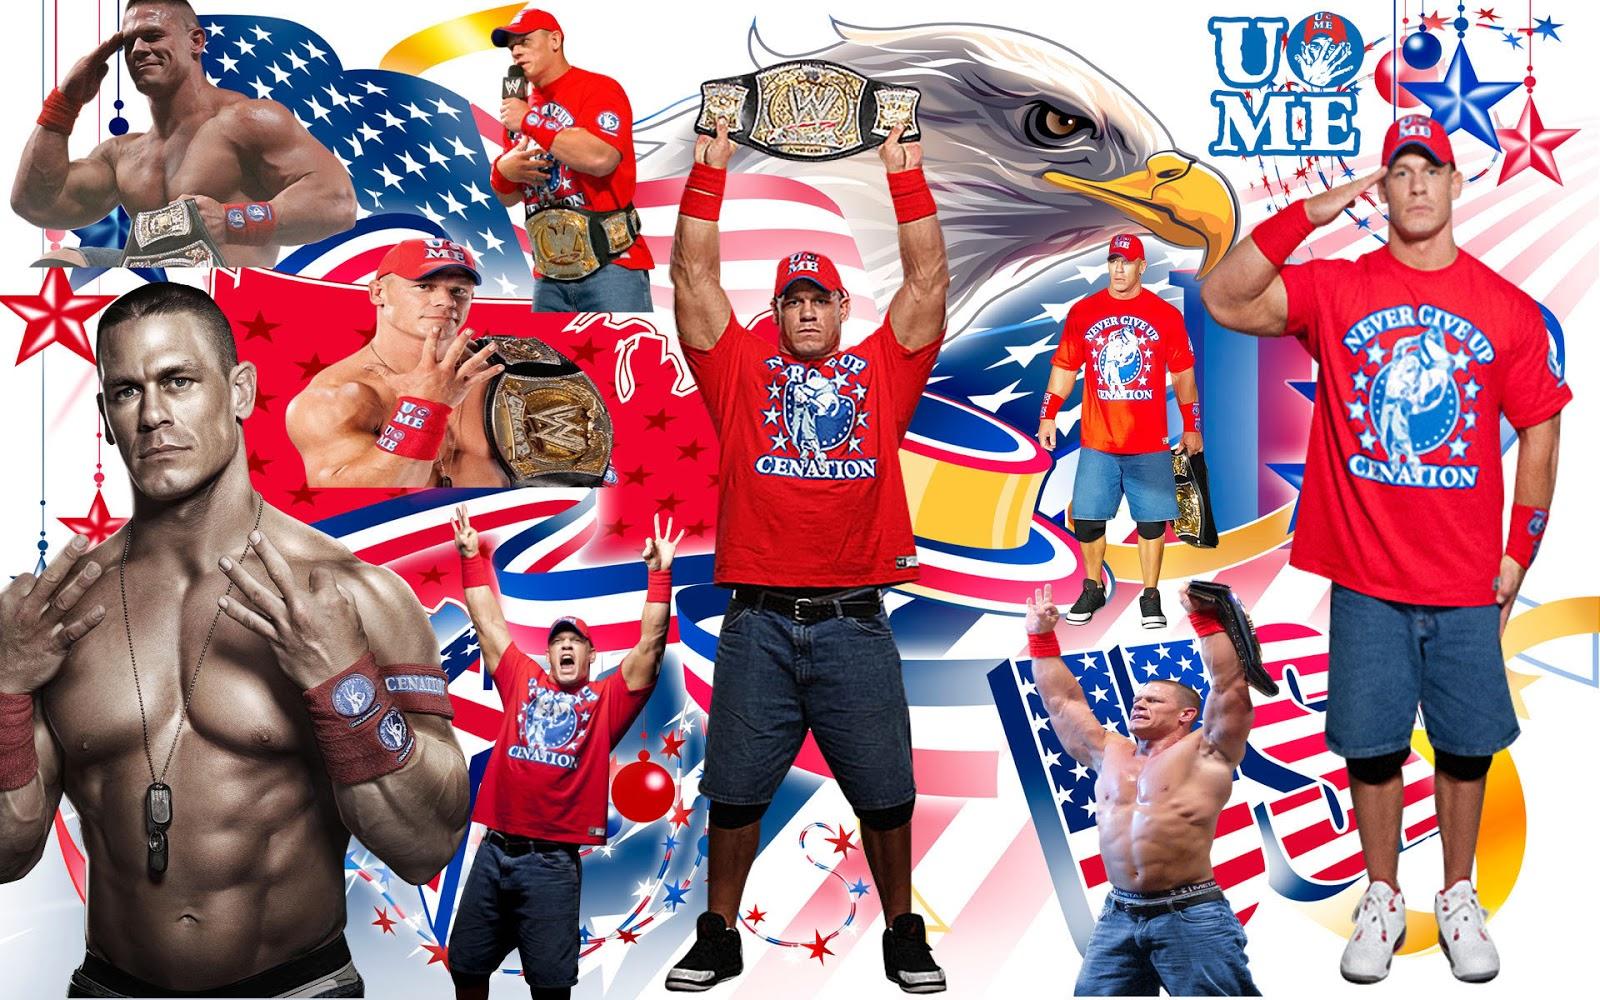 John Cena Full Wallpaper HD 1080p